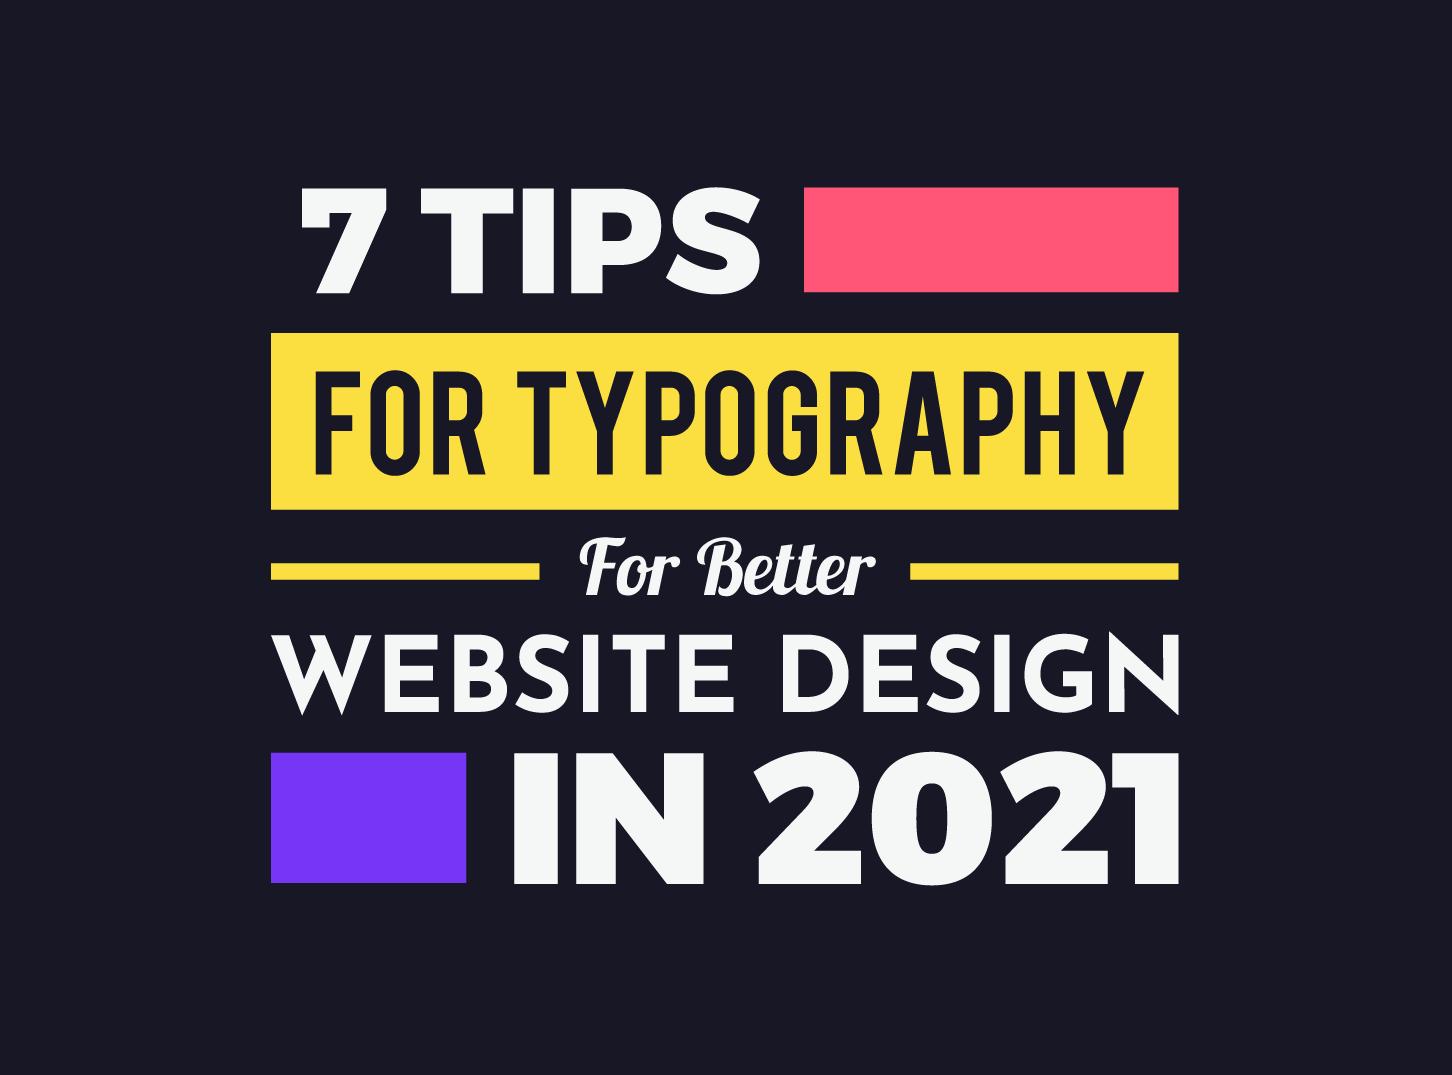 7 Tips For Typography for Better Website Design in 2021 - Inkyy Web Design Studio